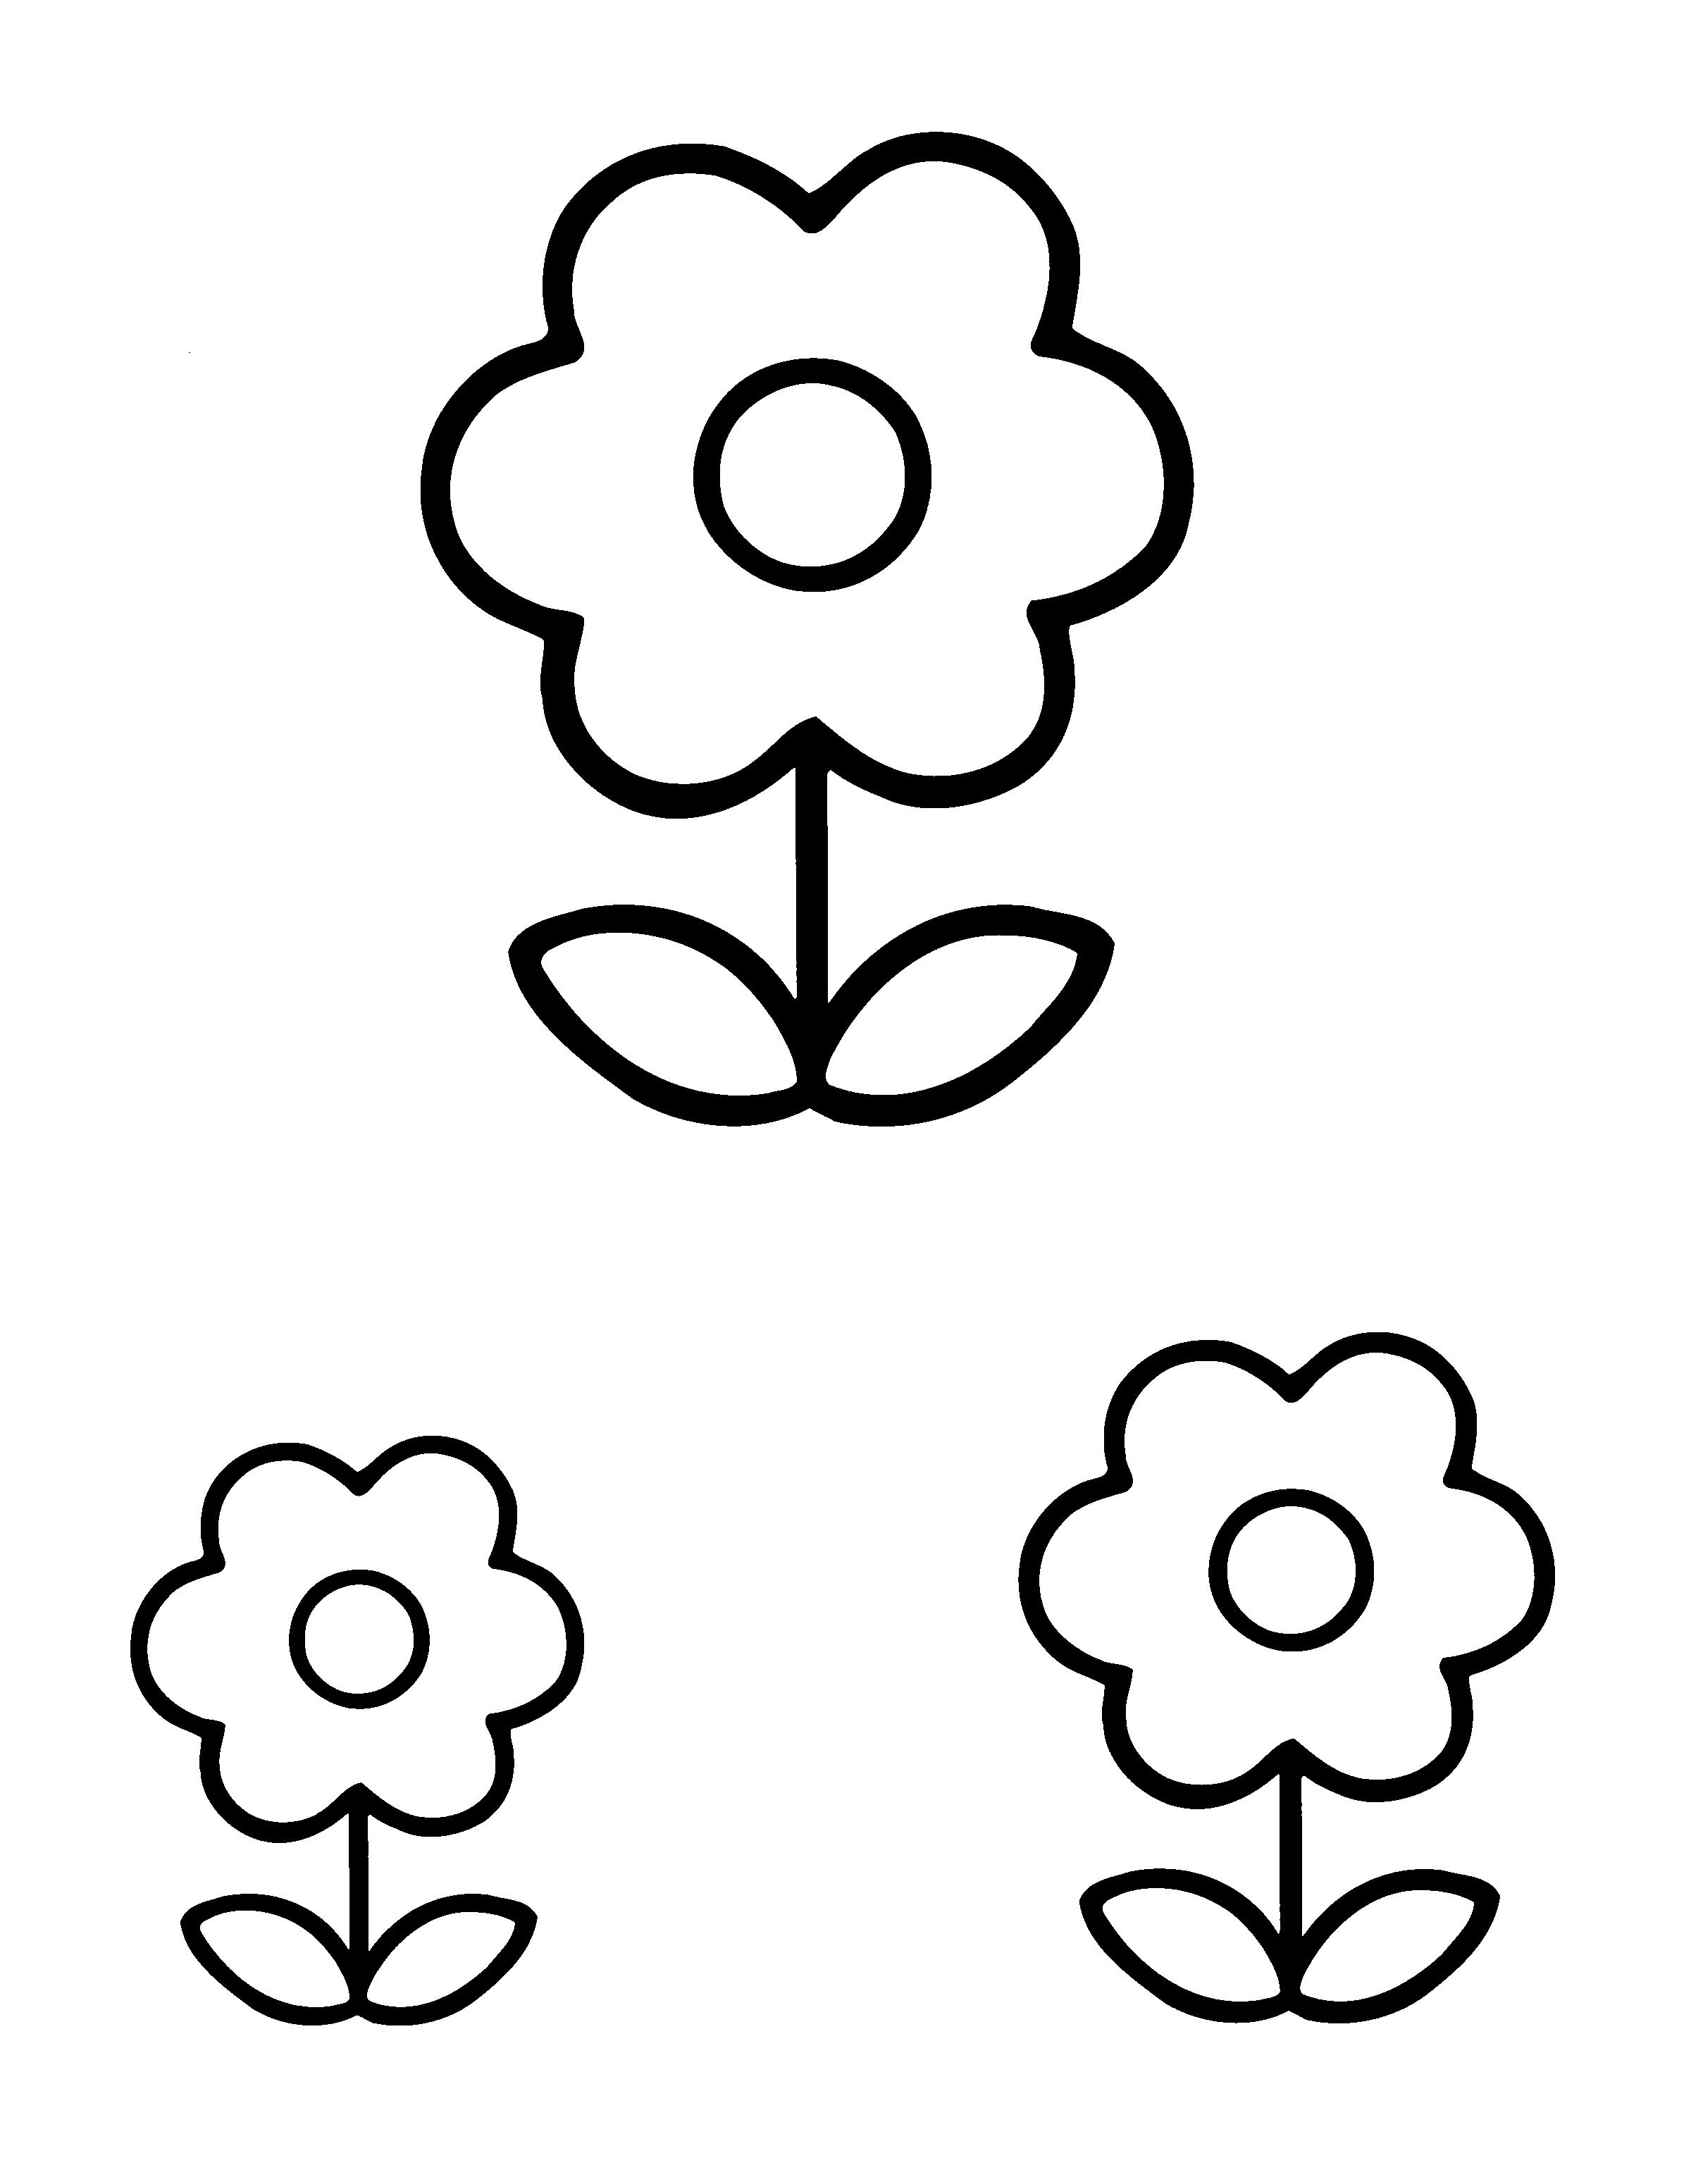 tekenen kleurplaten on coloring pages